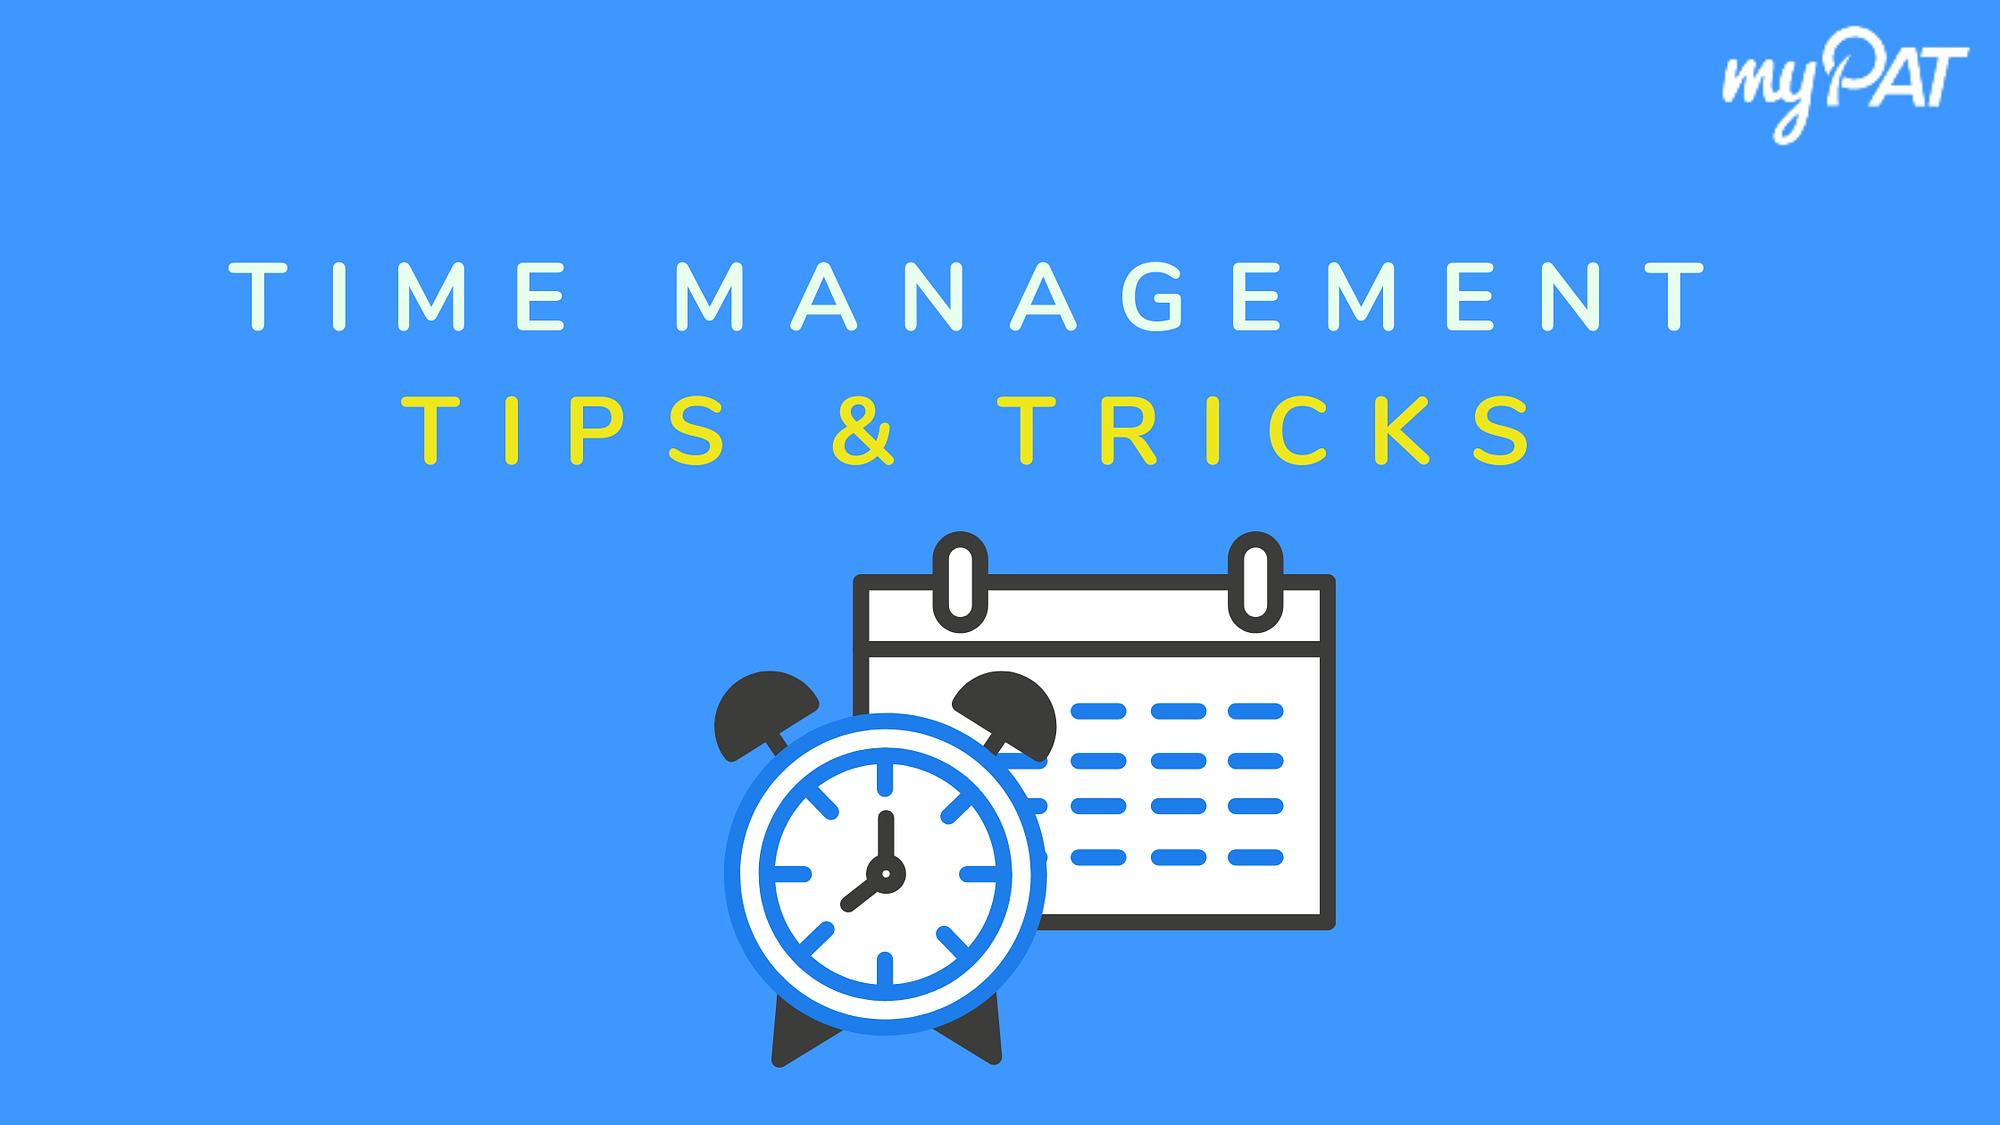 Time Management Tips & Tricks during Exam Preparation